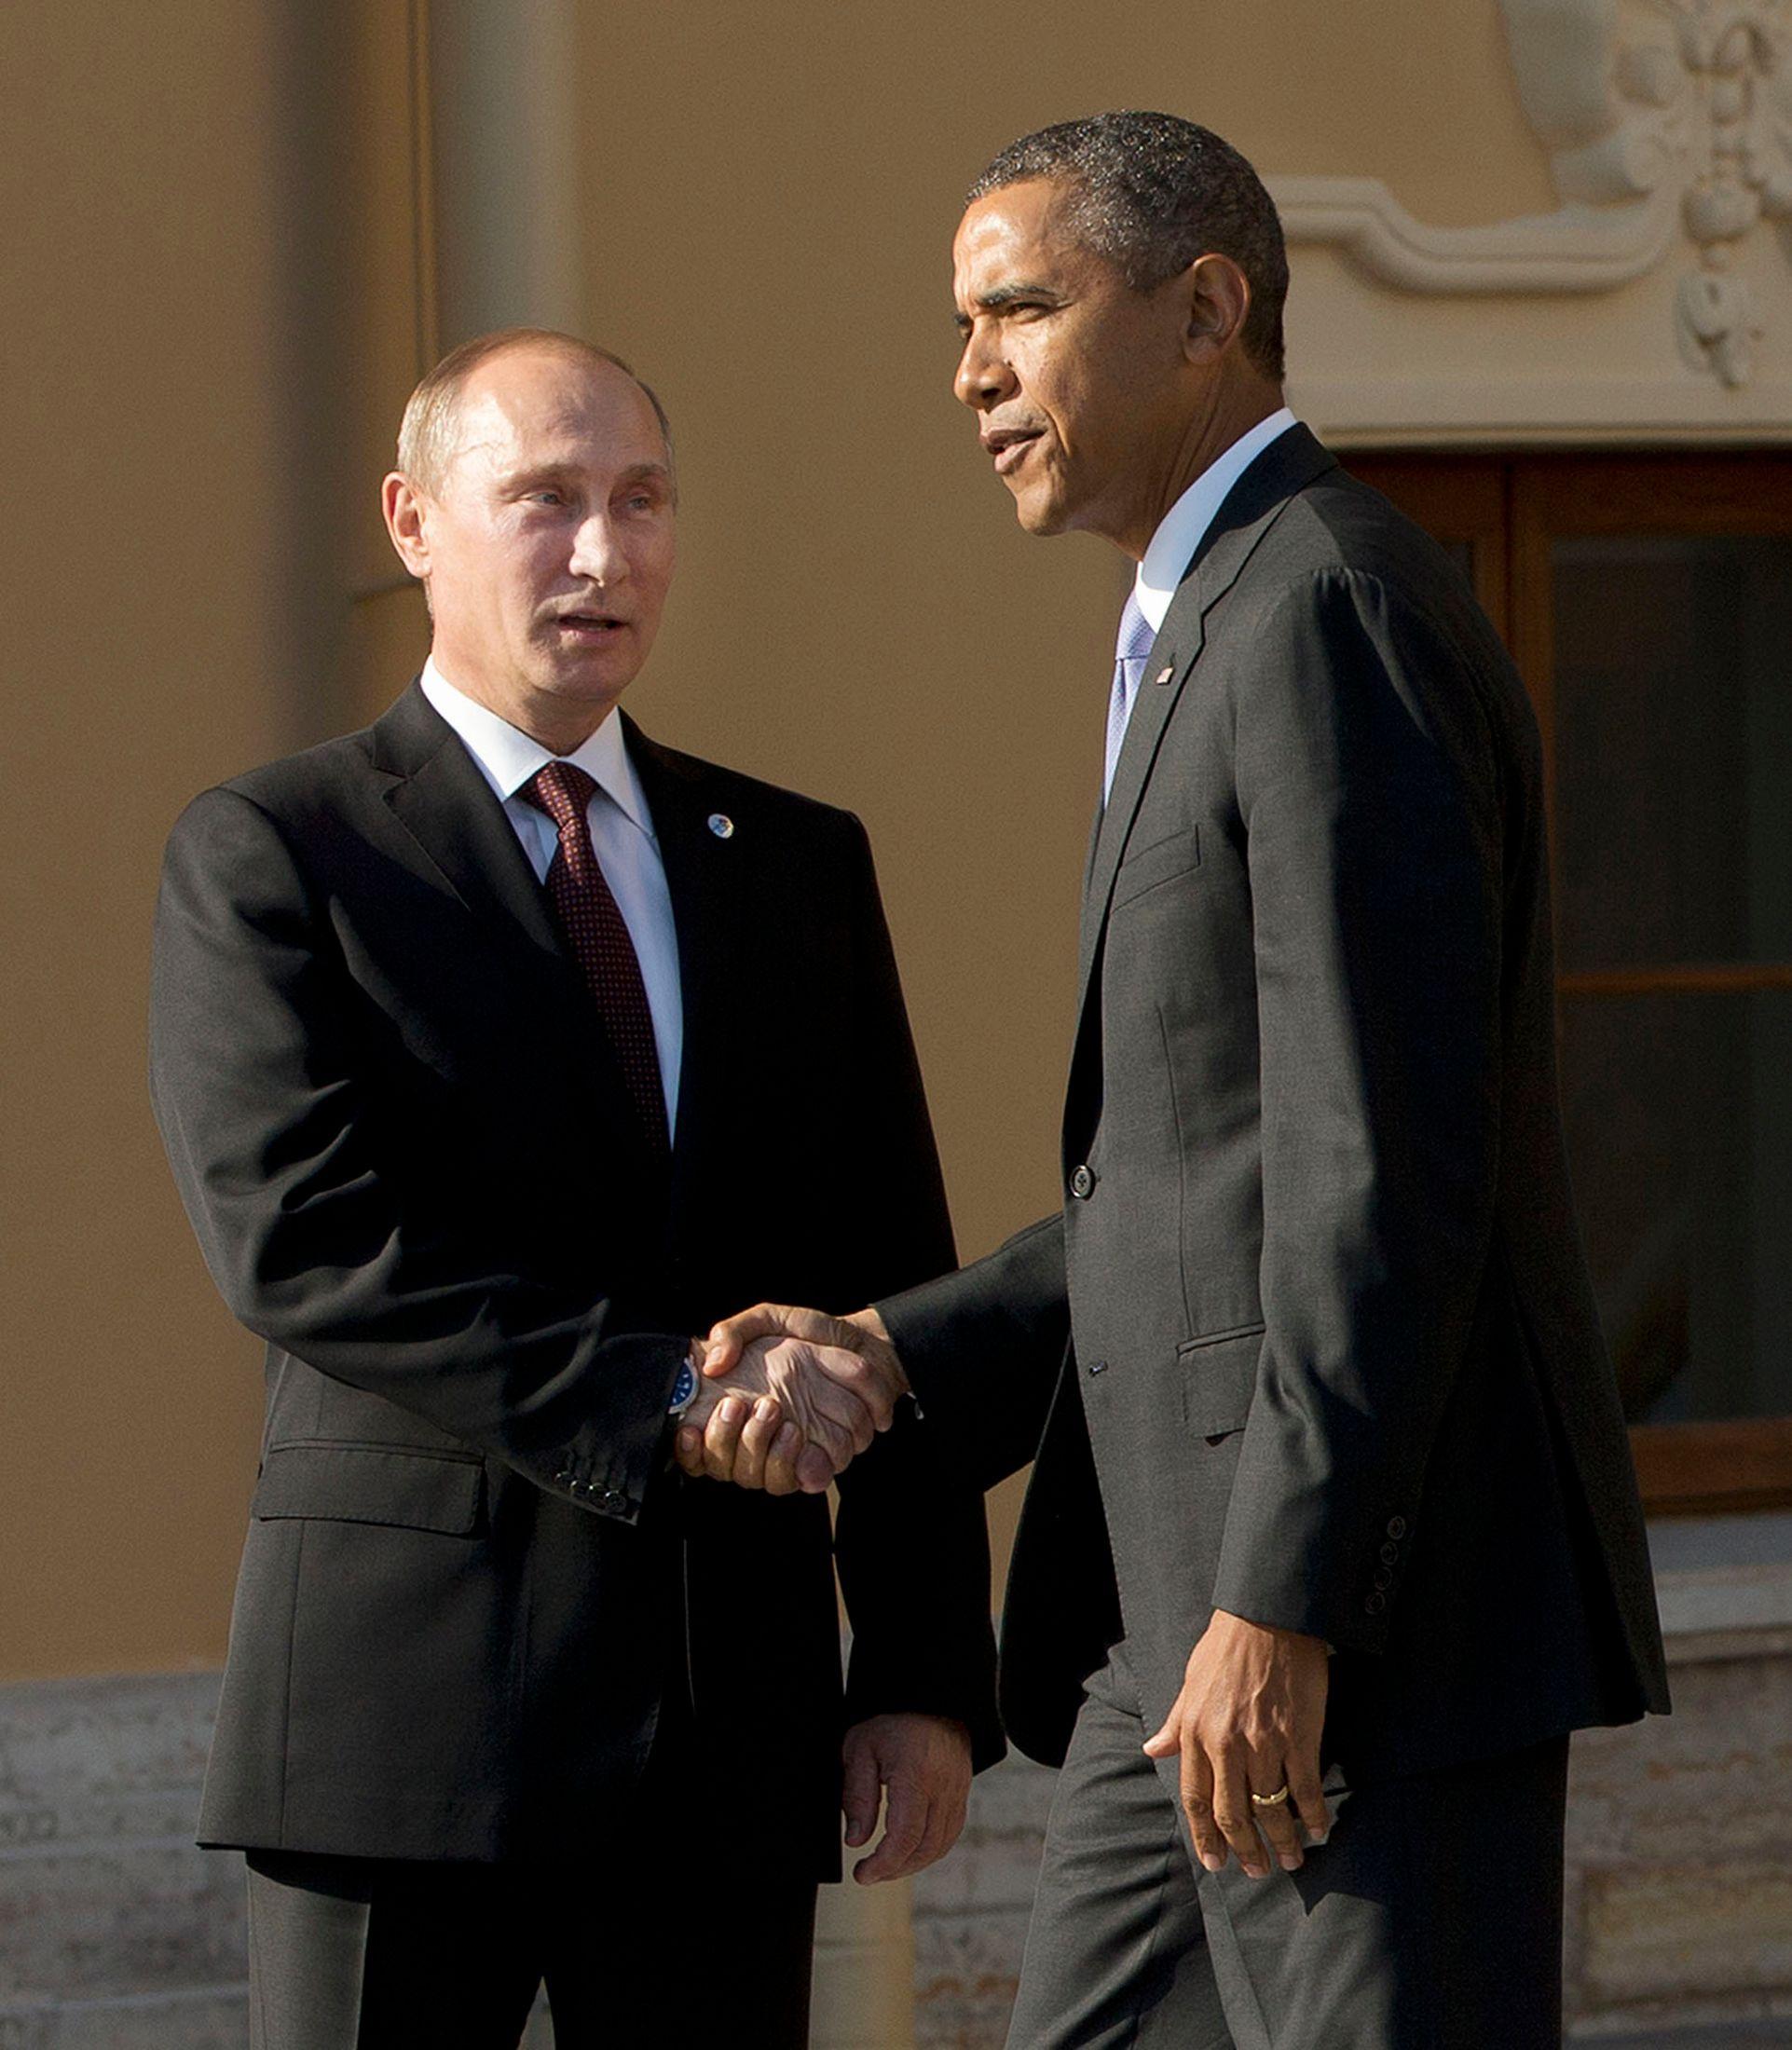 Piratage russe : de Washington ou Moscou, qui manipule qui ?